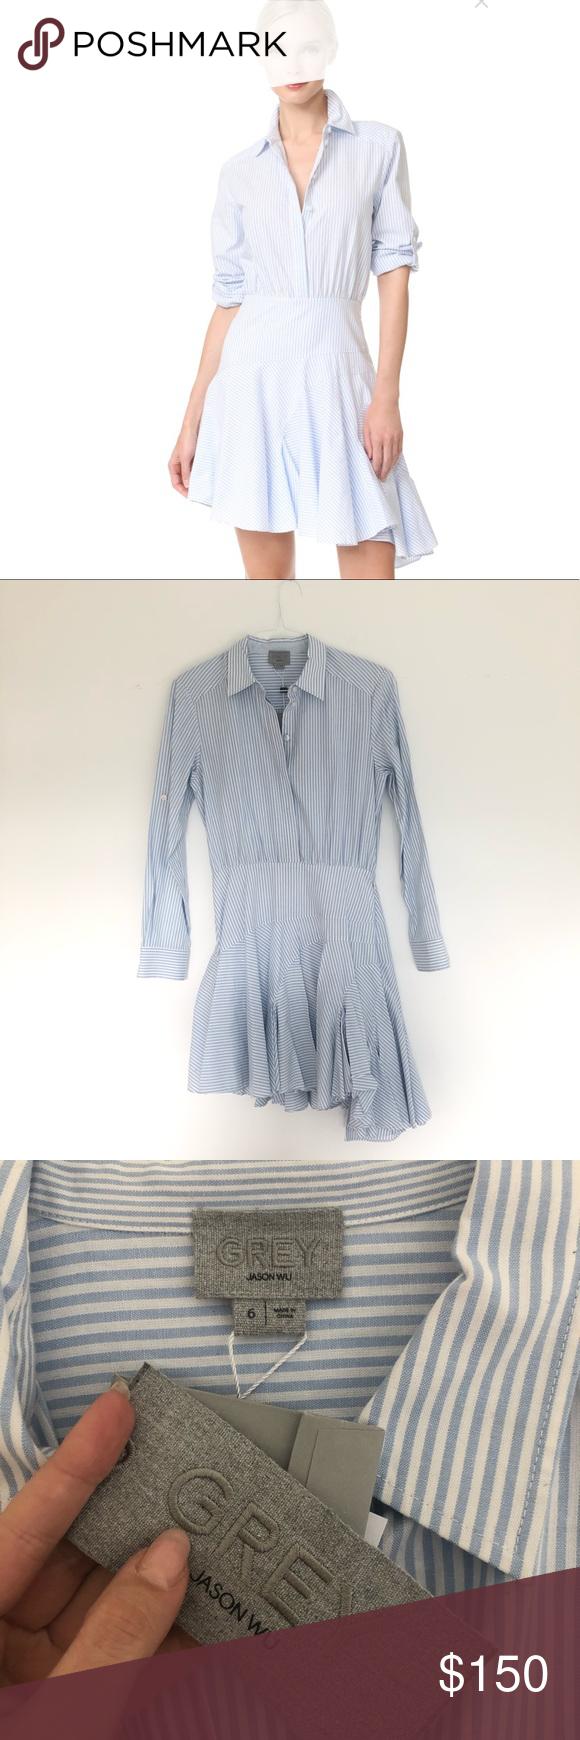 b10596e8fb3a JASON WU Grey Long Sleeve Asymmetrical Dress Brand new with tags Jason wu  Grey long sleeve